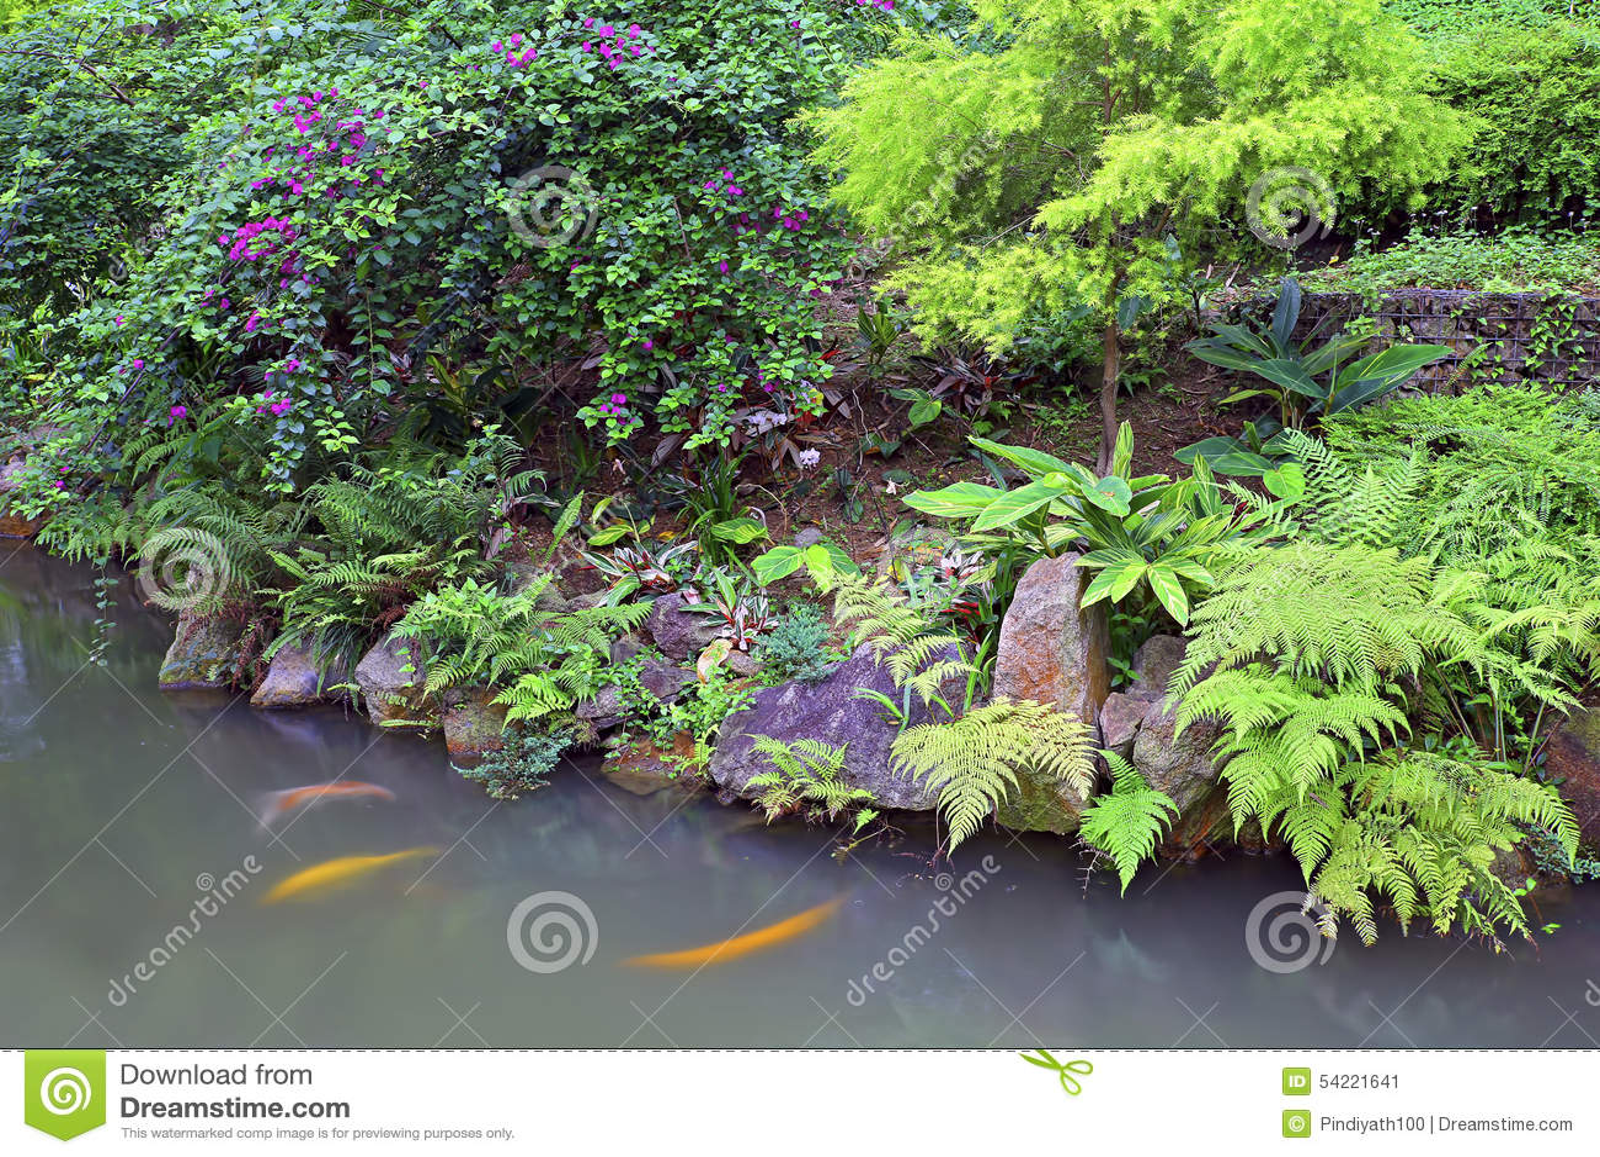 Tropical Garden With Koi Fish Pond Stock Photo Image 54221641